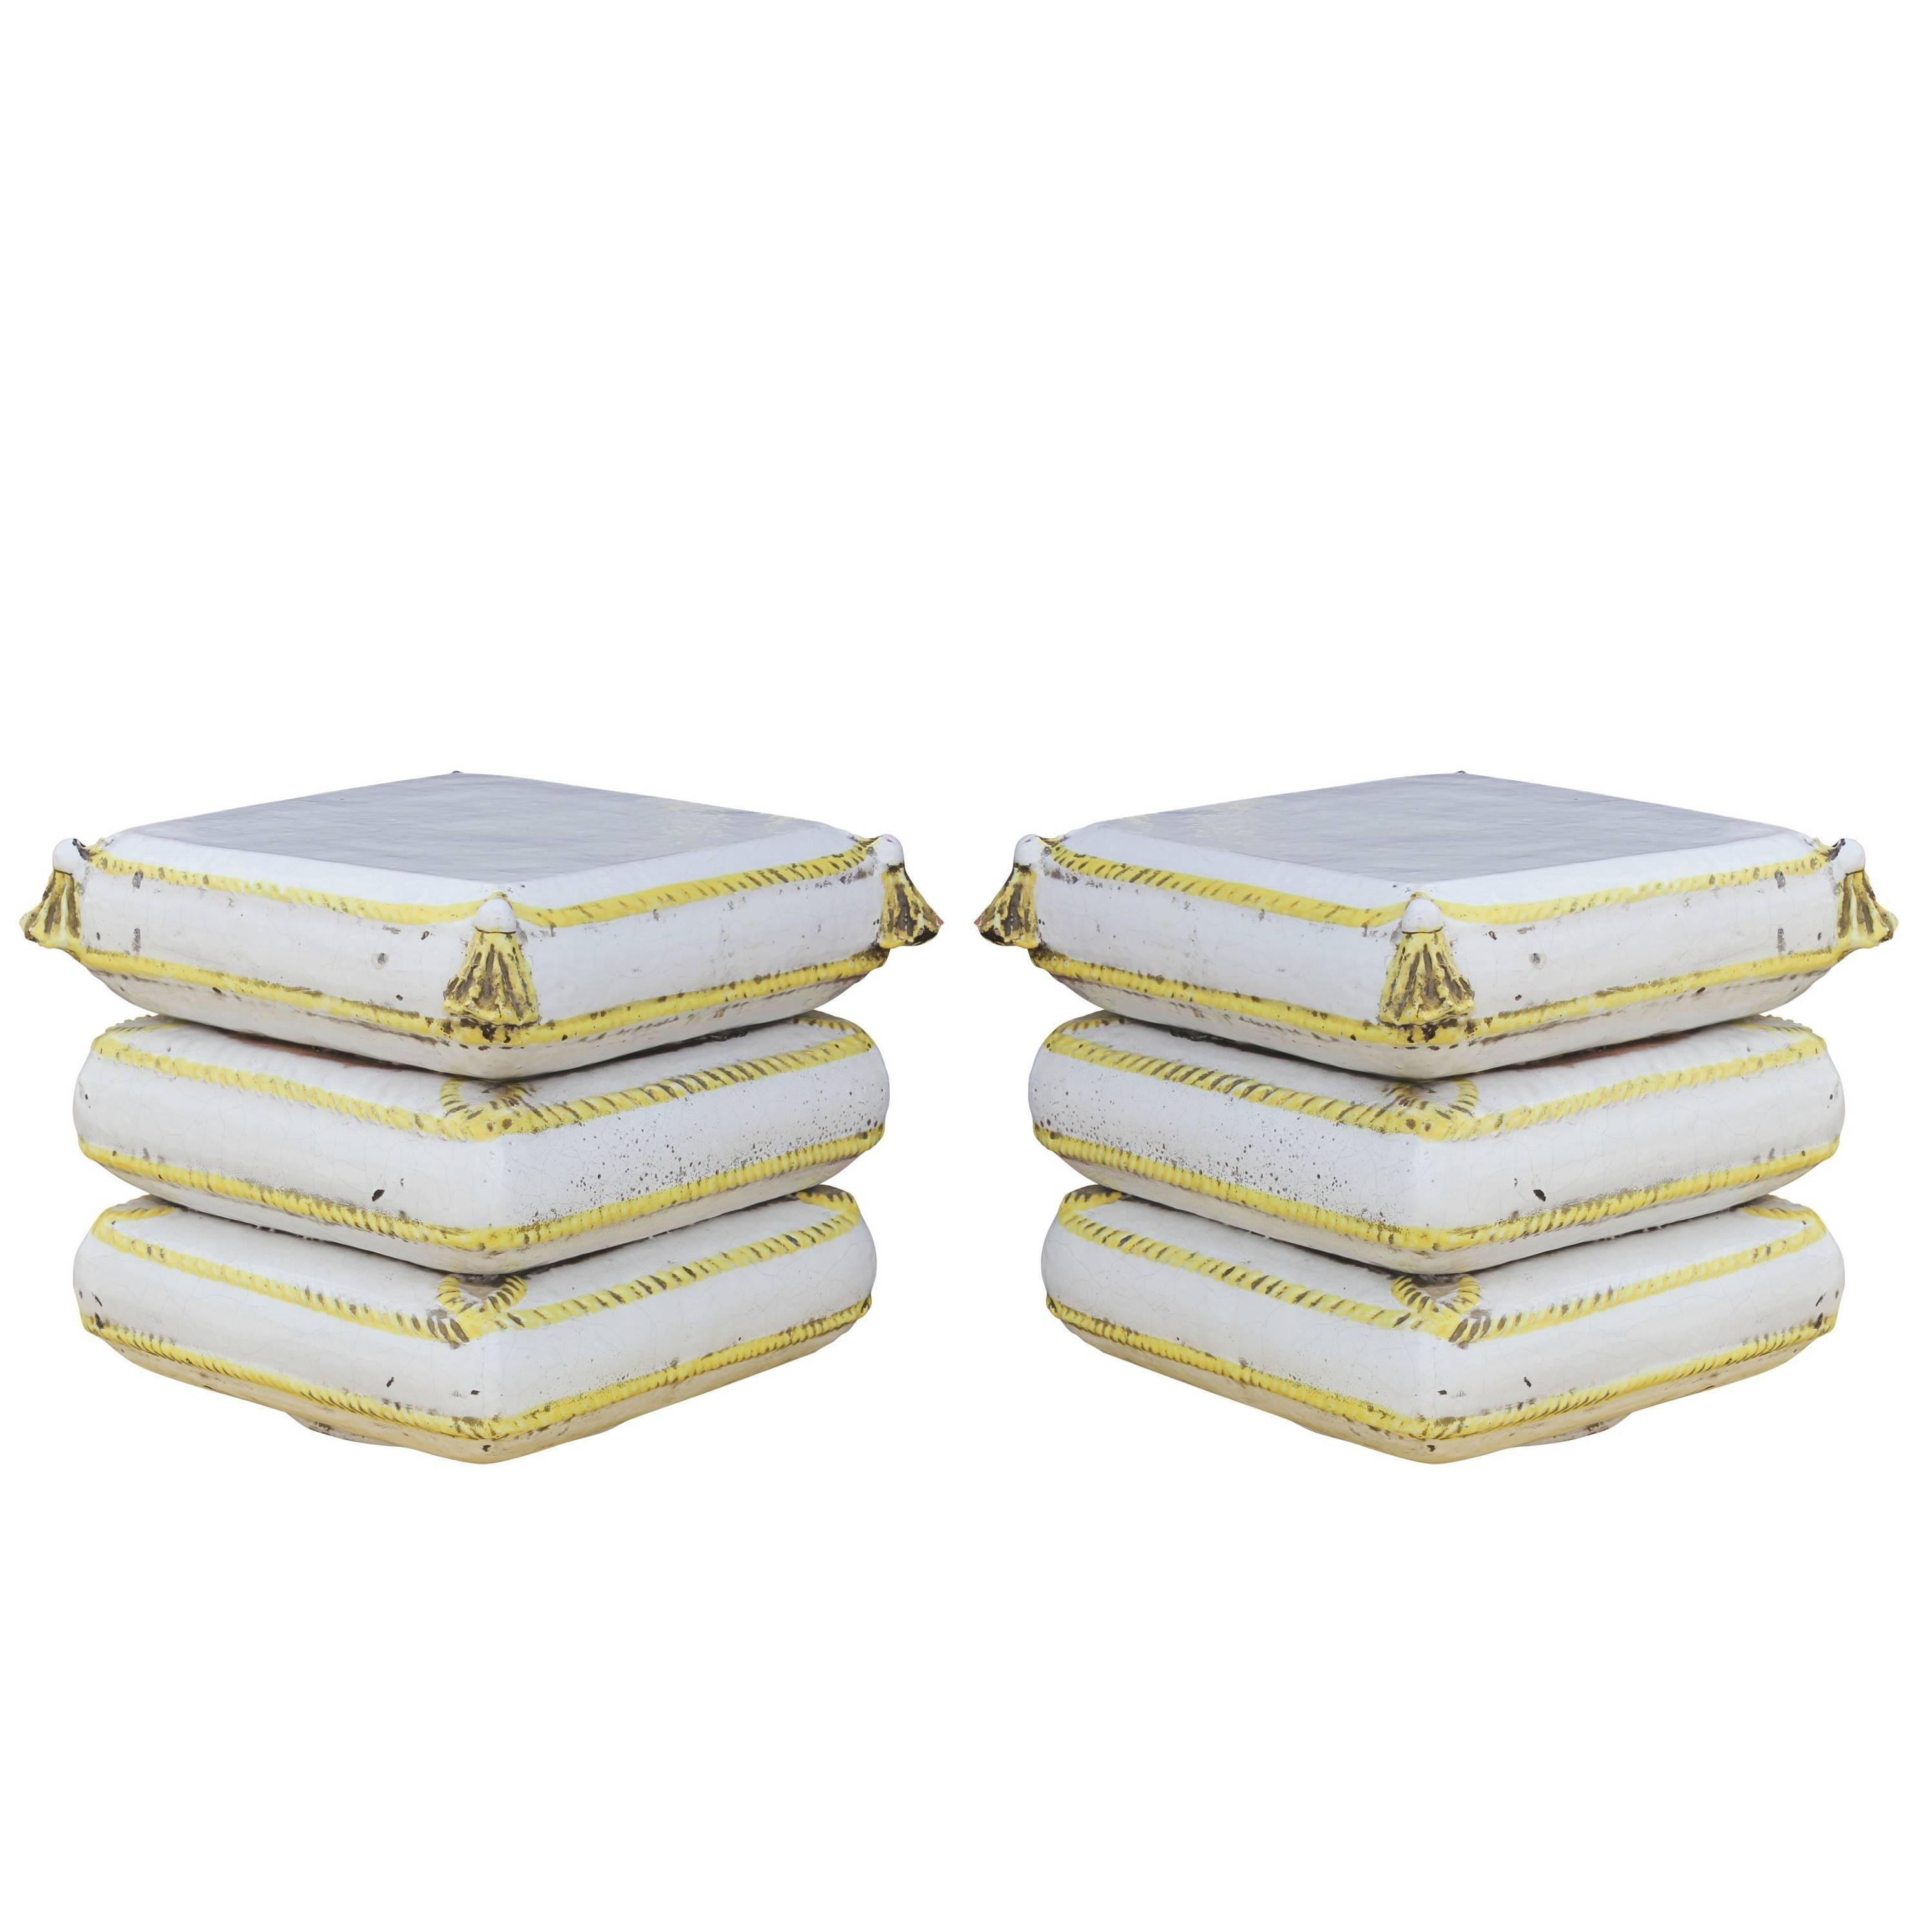 Bon Pair Of Italian Terracotta Or Ceramic Garden Stools In White With Yellow  Trim